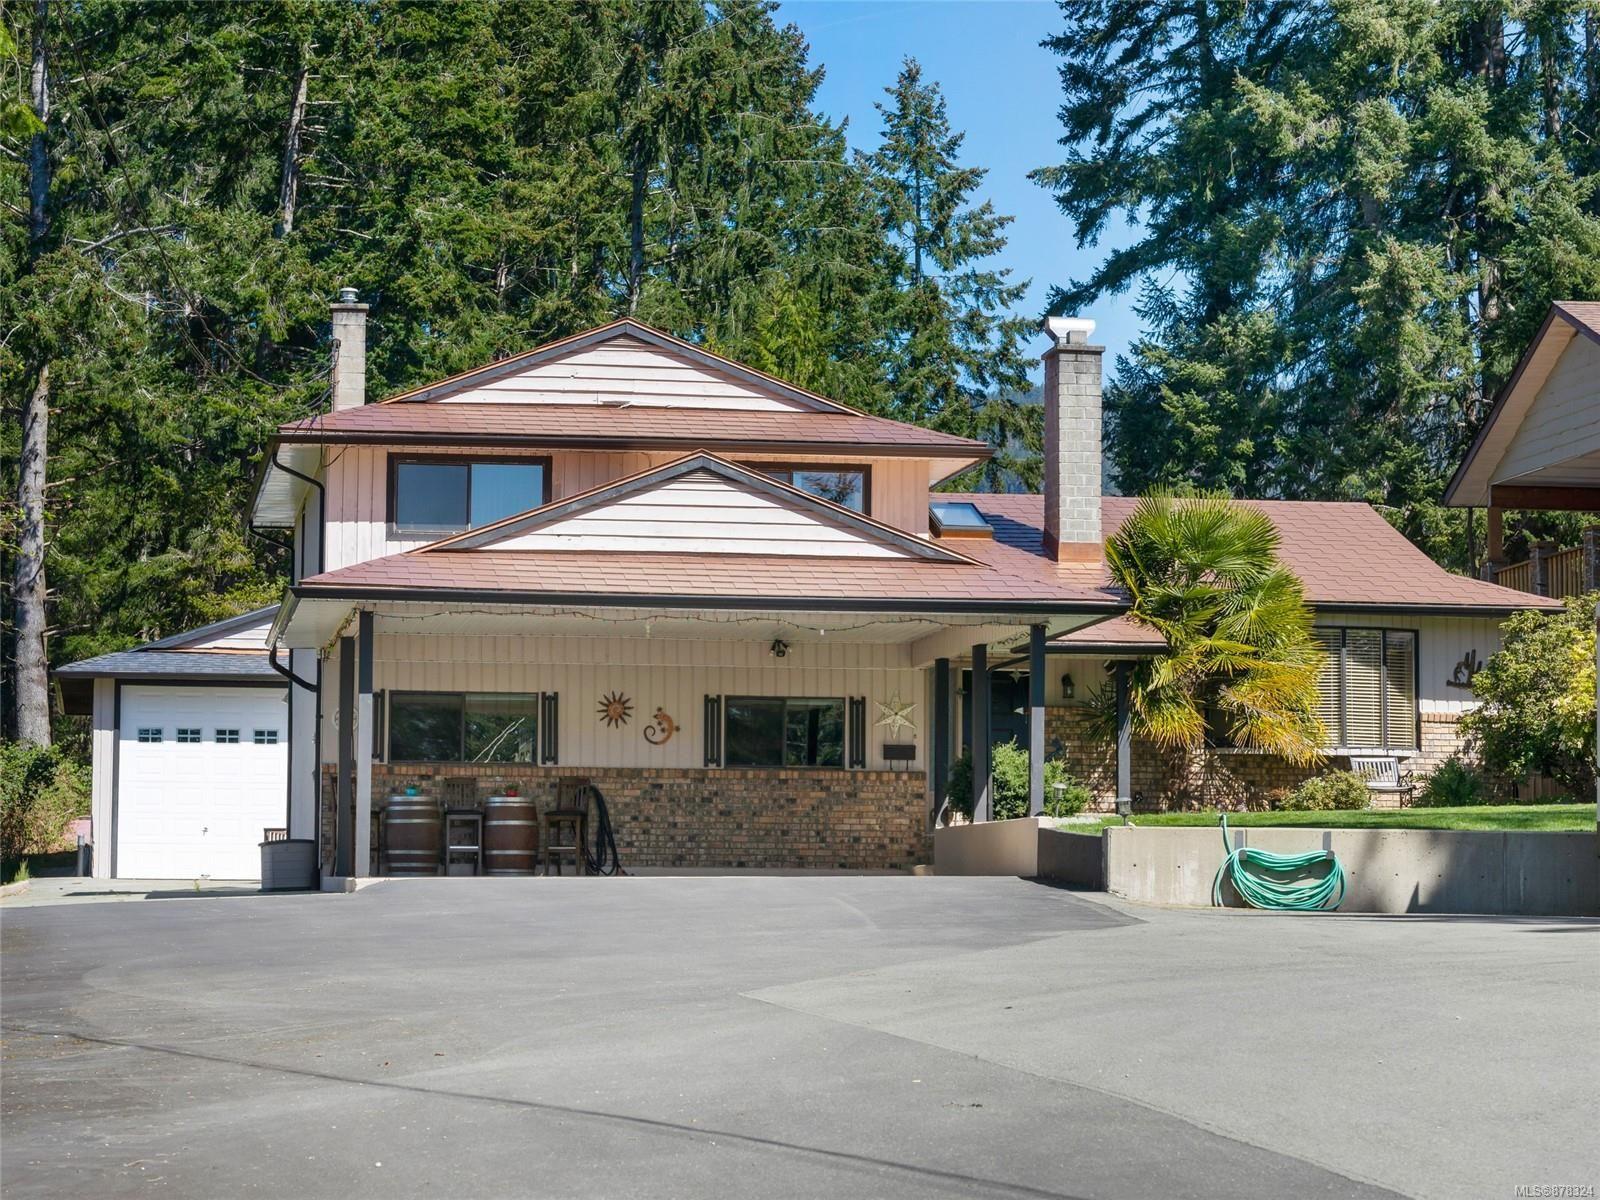 Photo 48: Photos: 3875 Moore Rd in : PA Port Alberni House for sale (Port Alberni)  : MLS®# 878324